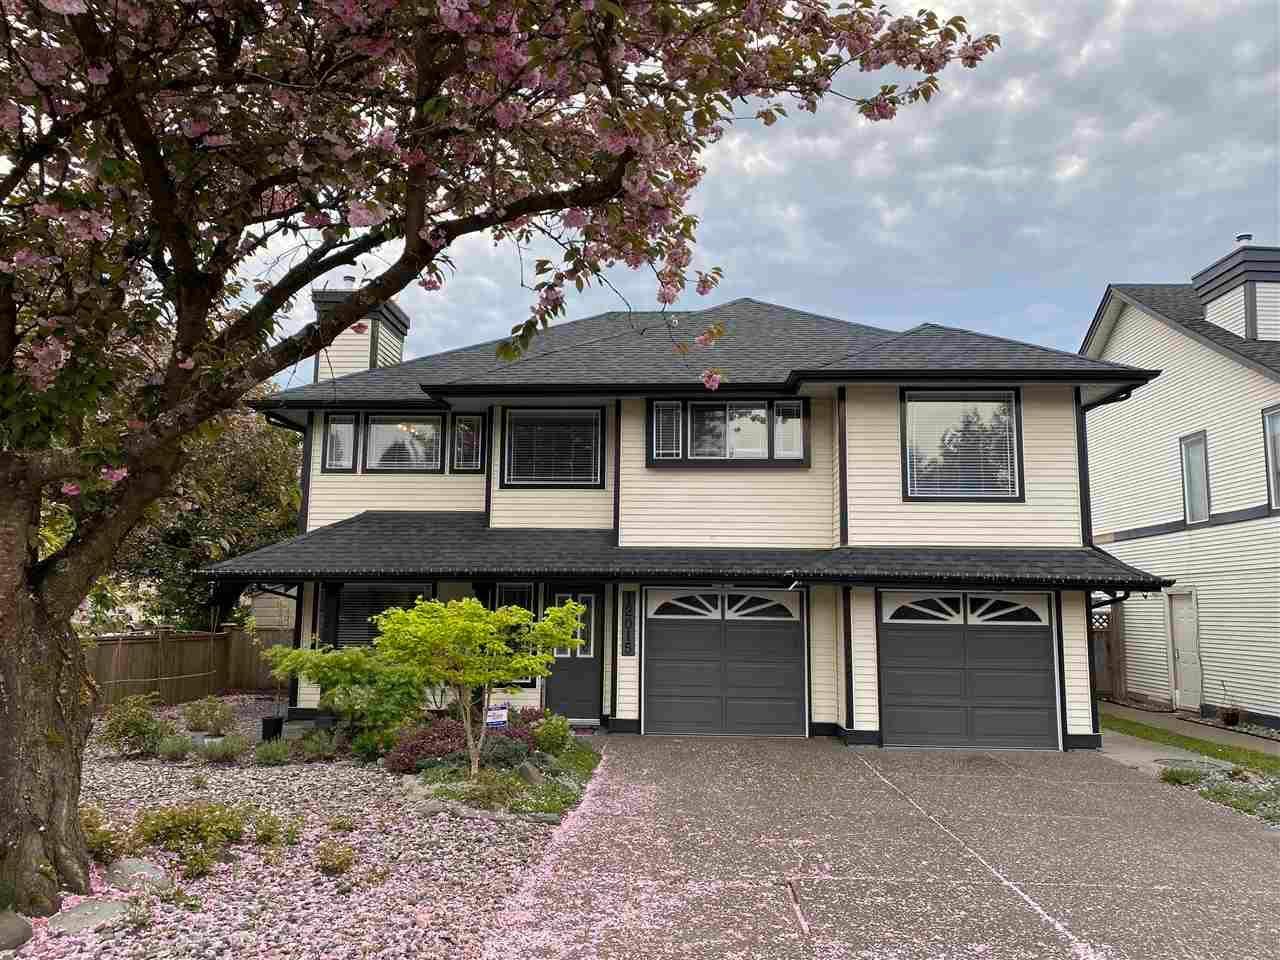 Main Photo: 12015 205 Street in Maple Ridge: Northwest Maple Ridge House for sale : MLS®# R2574791